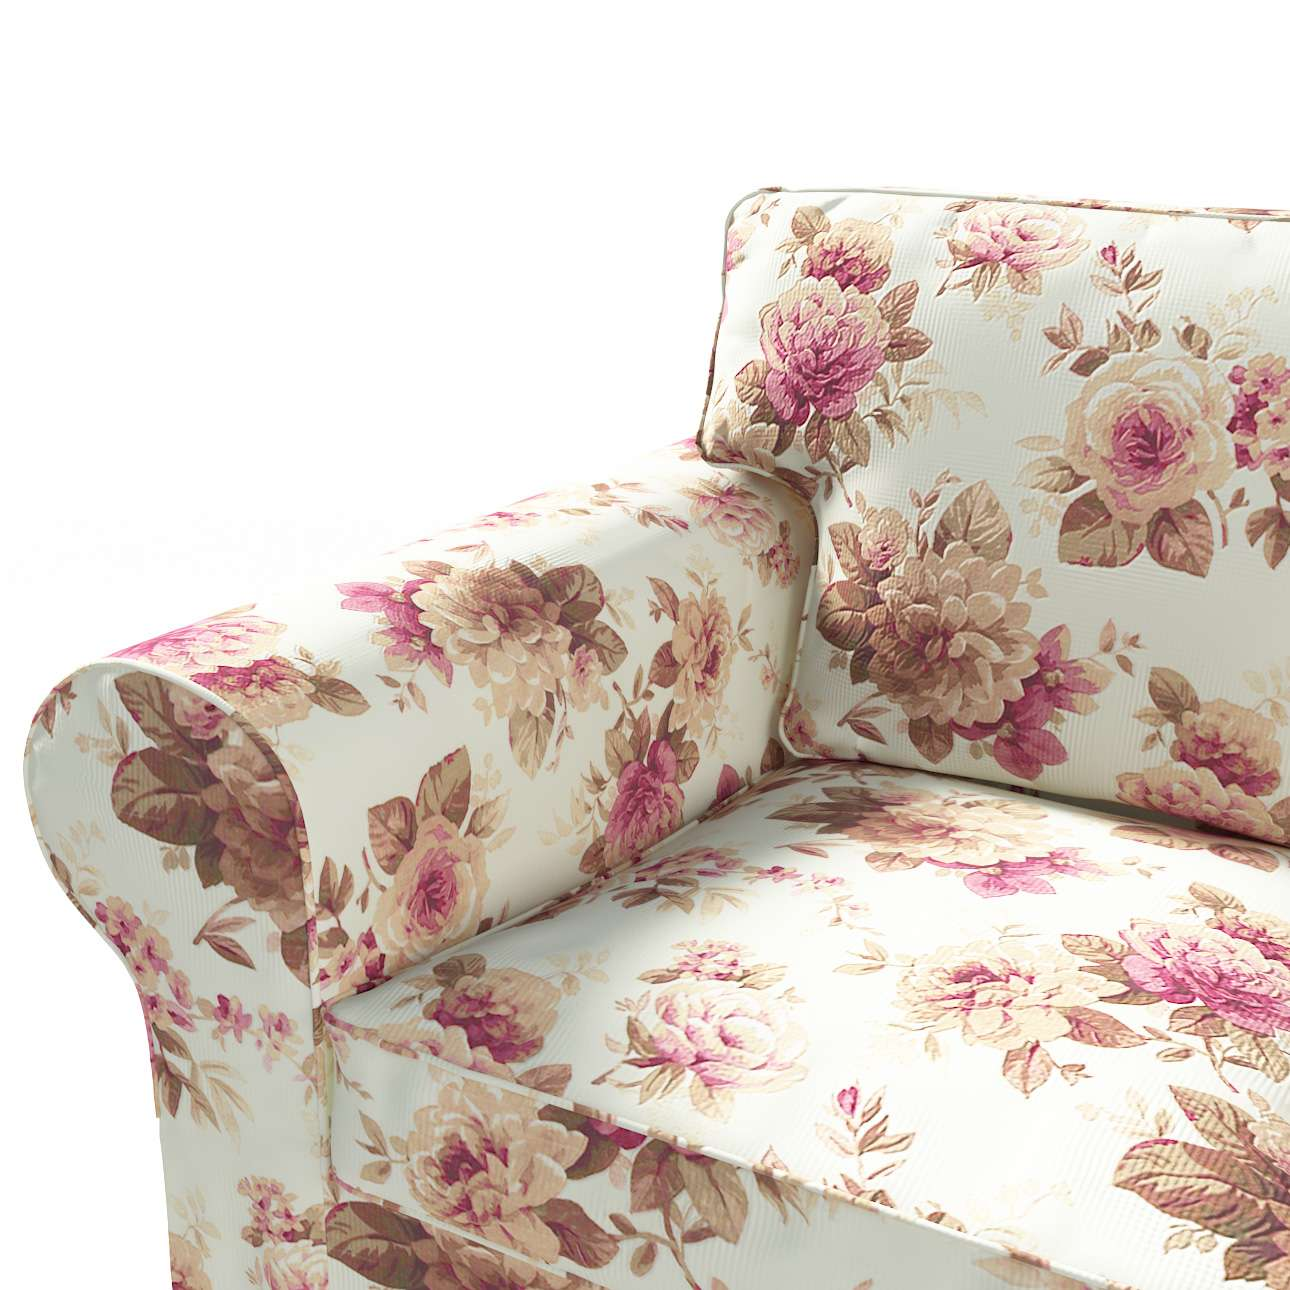 Ektorp 3-Sitzer Schlafsofabezug, ALTES Modell Sofahusse Ektorp 3-Sitzer Schlafsofa von der Kollektion Mirella, Stoff: 141-06